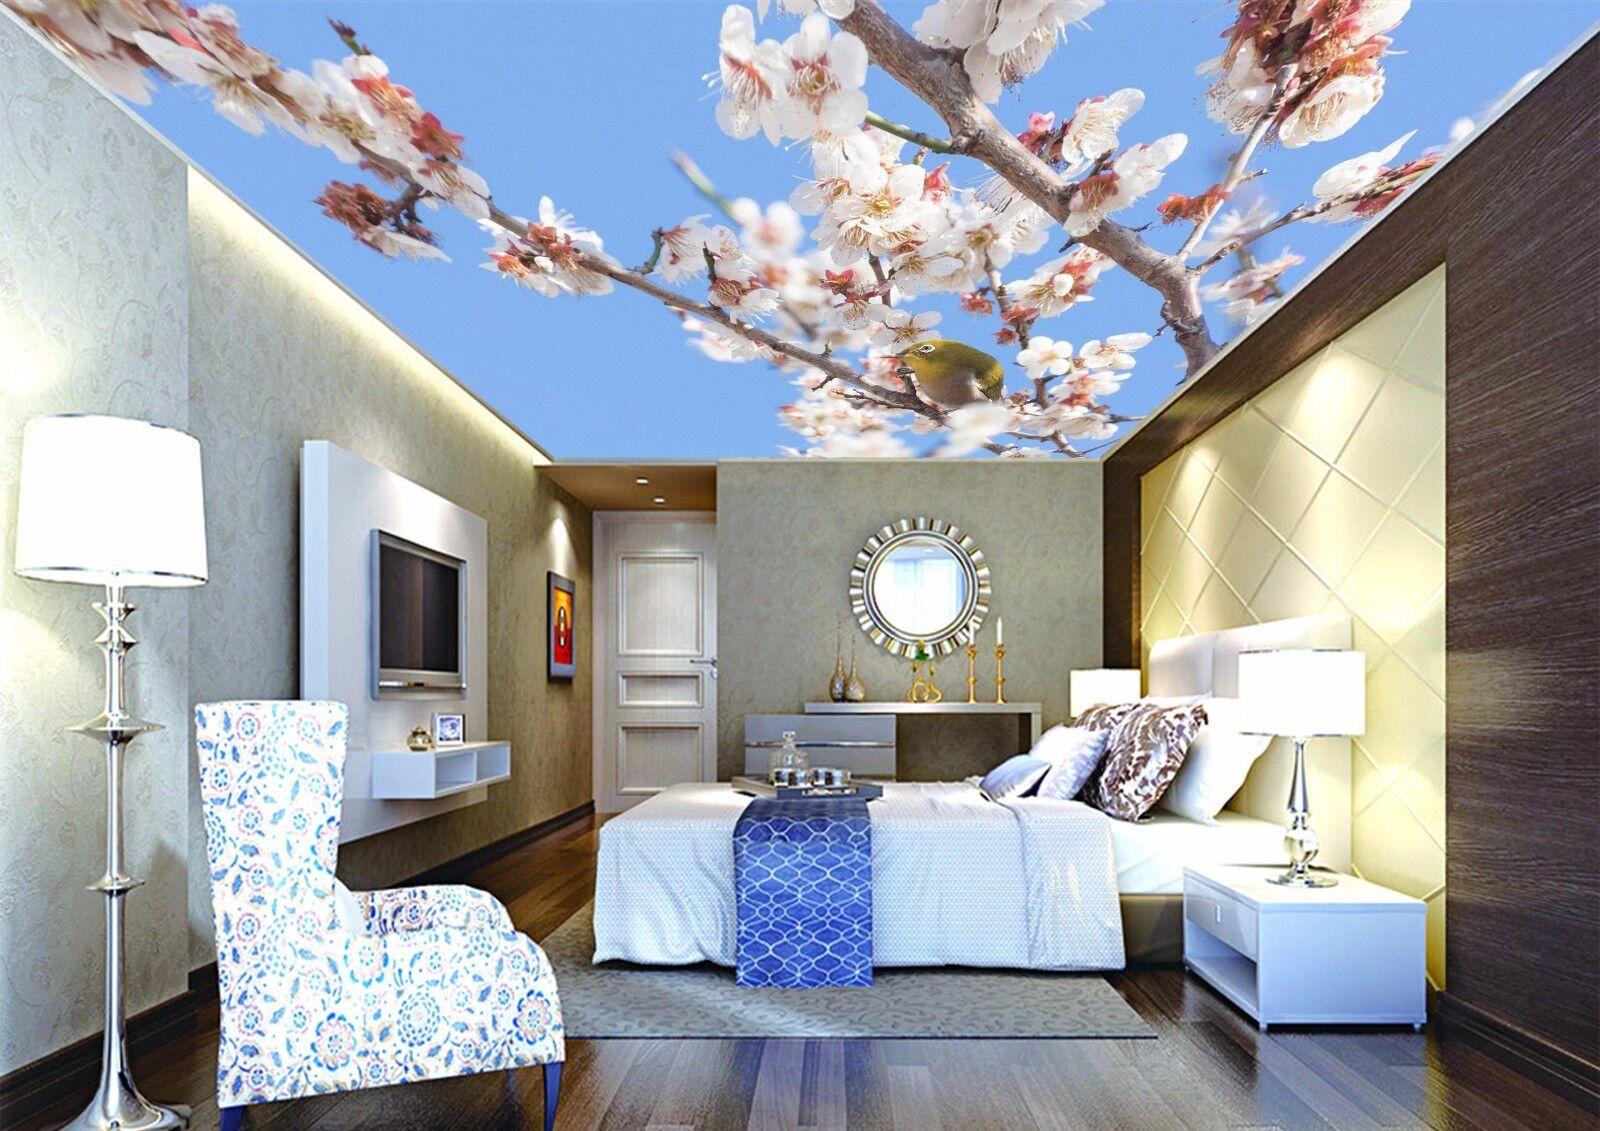 3D Peach Blossom Cute Bird 5 Ceiling Wall Paper Print Wall Indoor Wall Murals CA